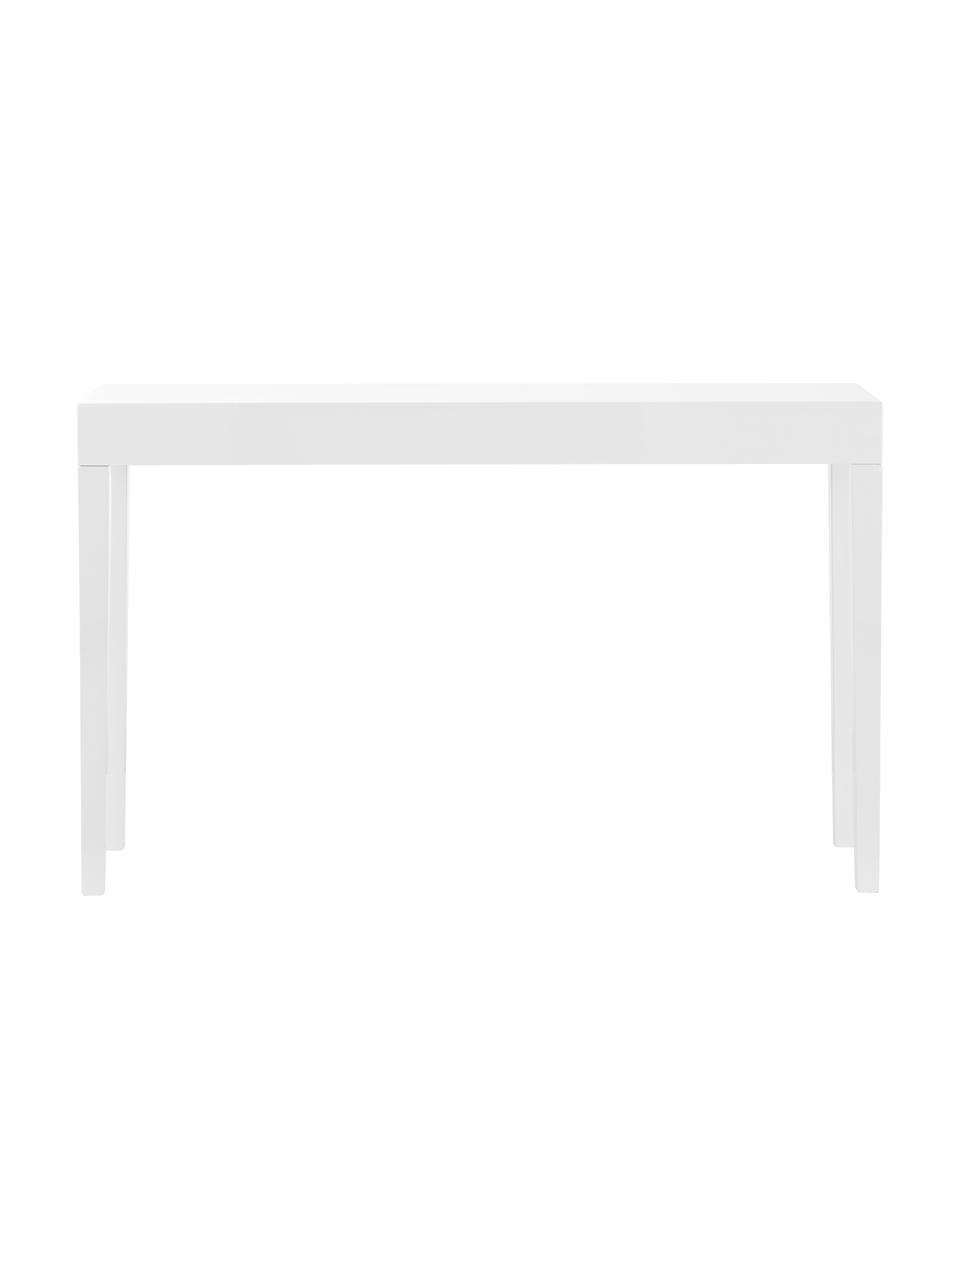 Handgemaakte sidetable Kayson, MDF, Wit, B 130 x D 34 cm